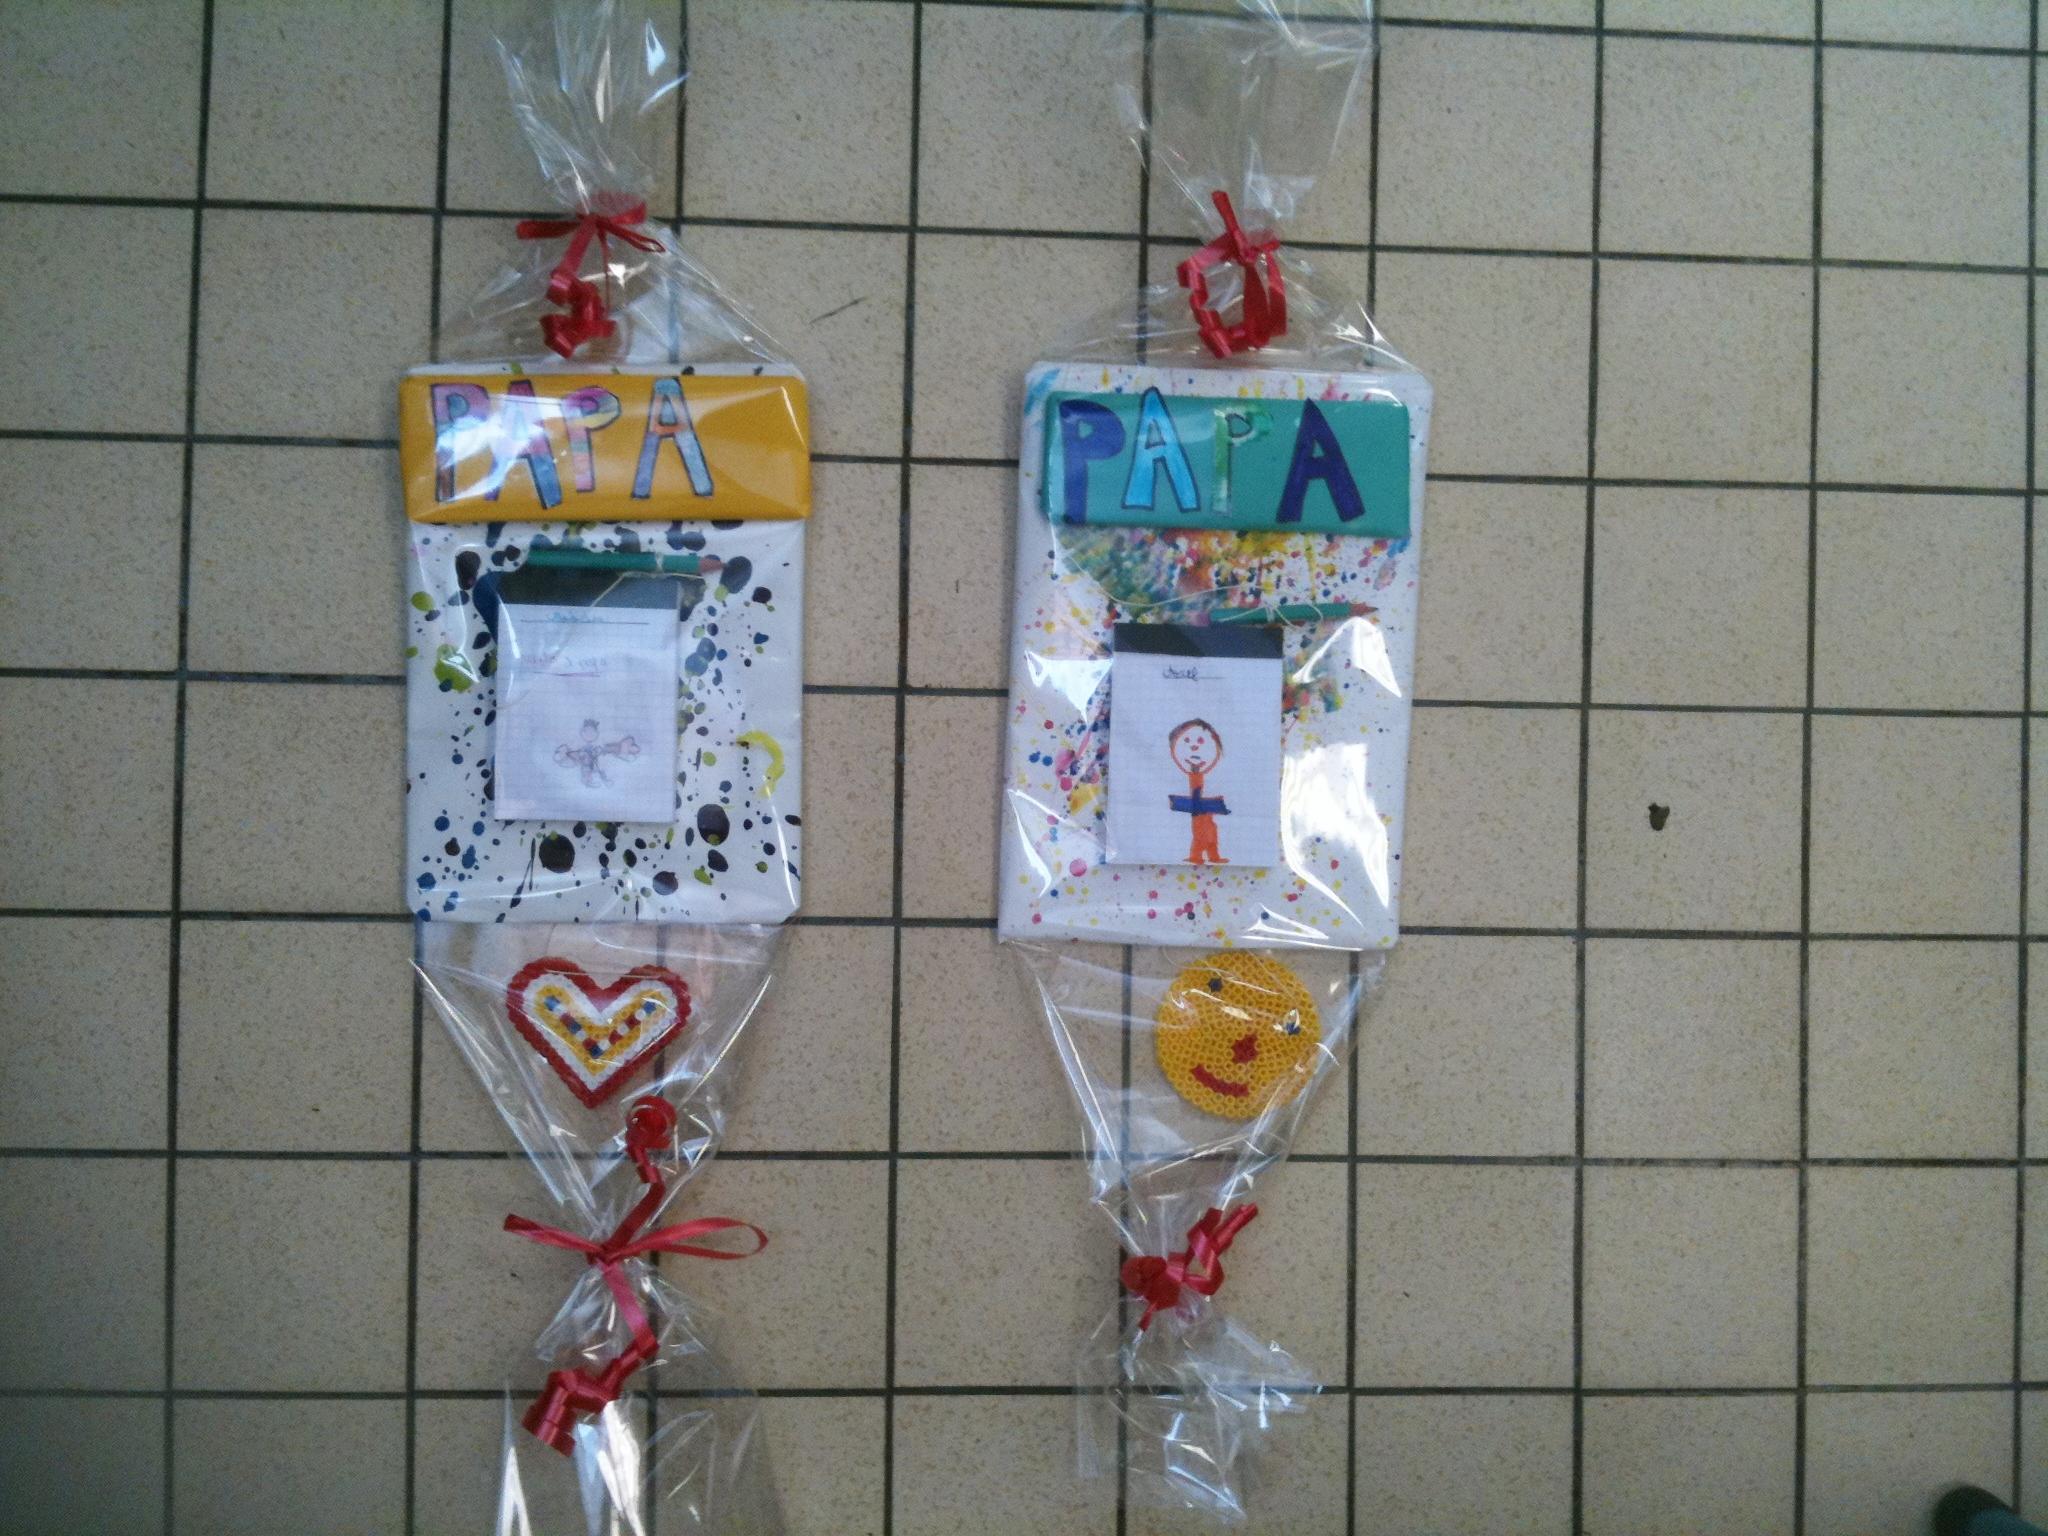 Bricolage fete des pere maternelle fashion designs - Fete des peres bricolage ...